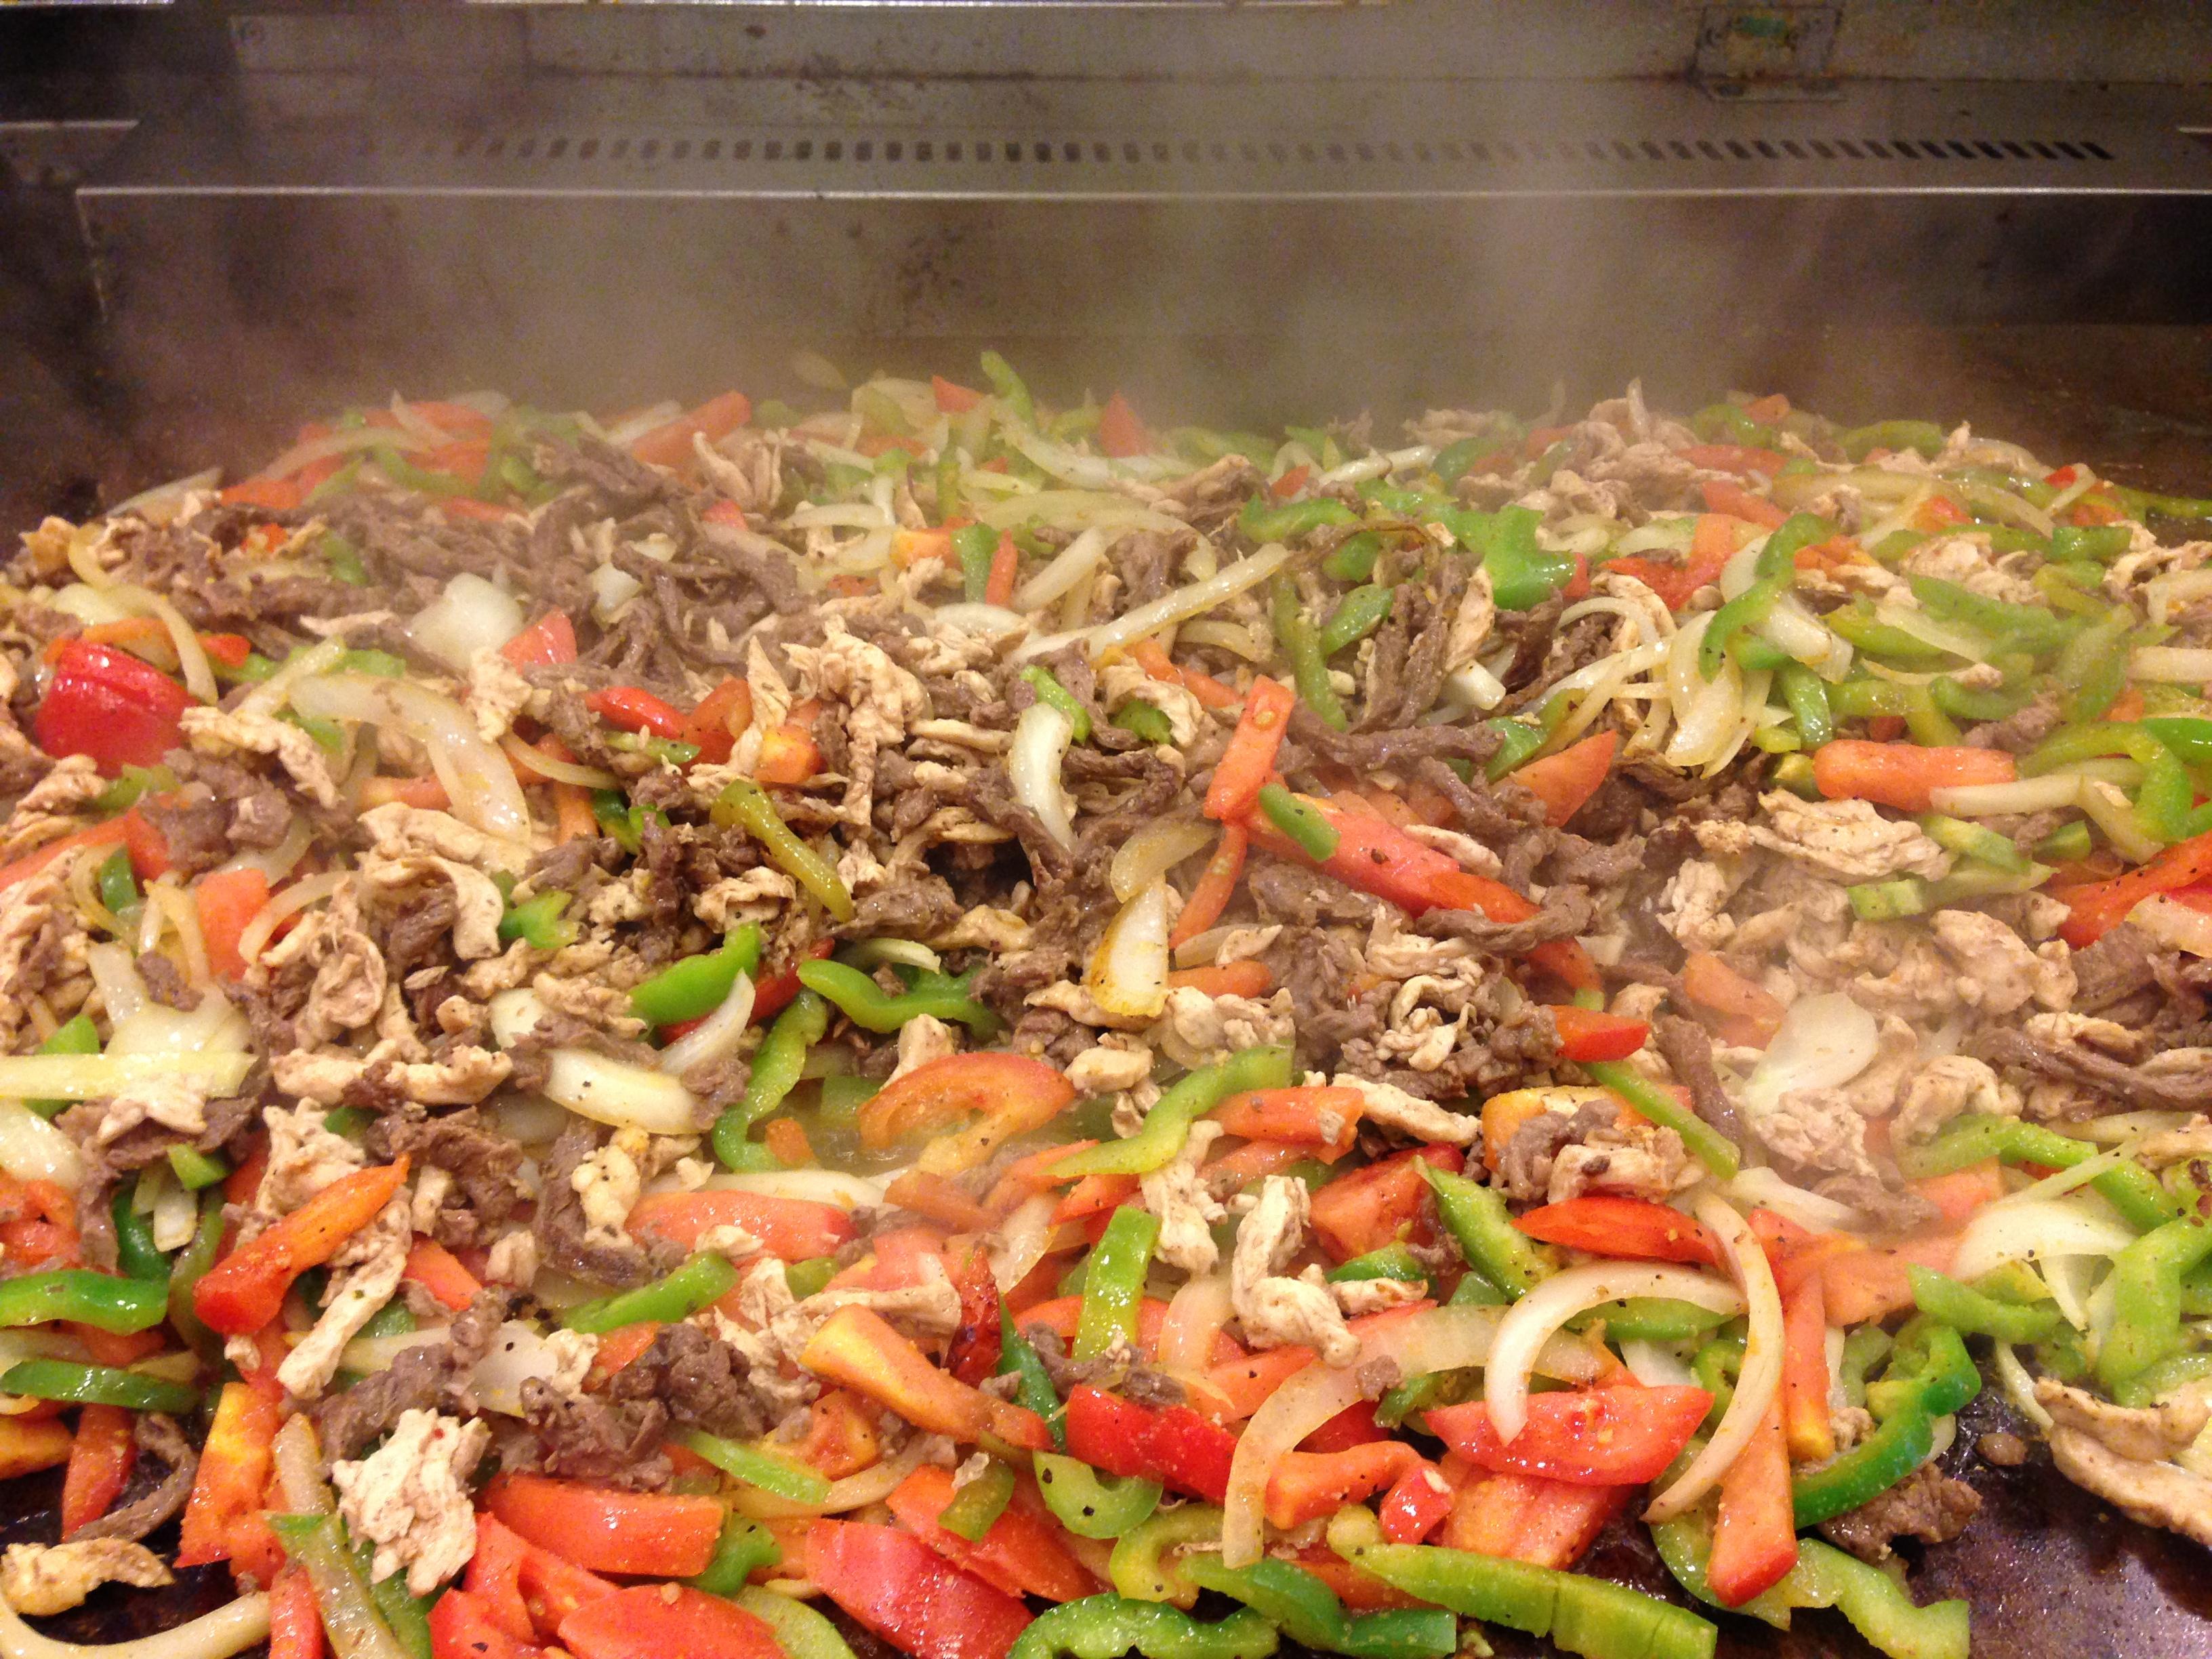 Fajitas Chicken Or Steak For 6 Image